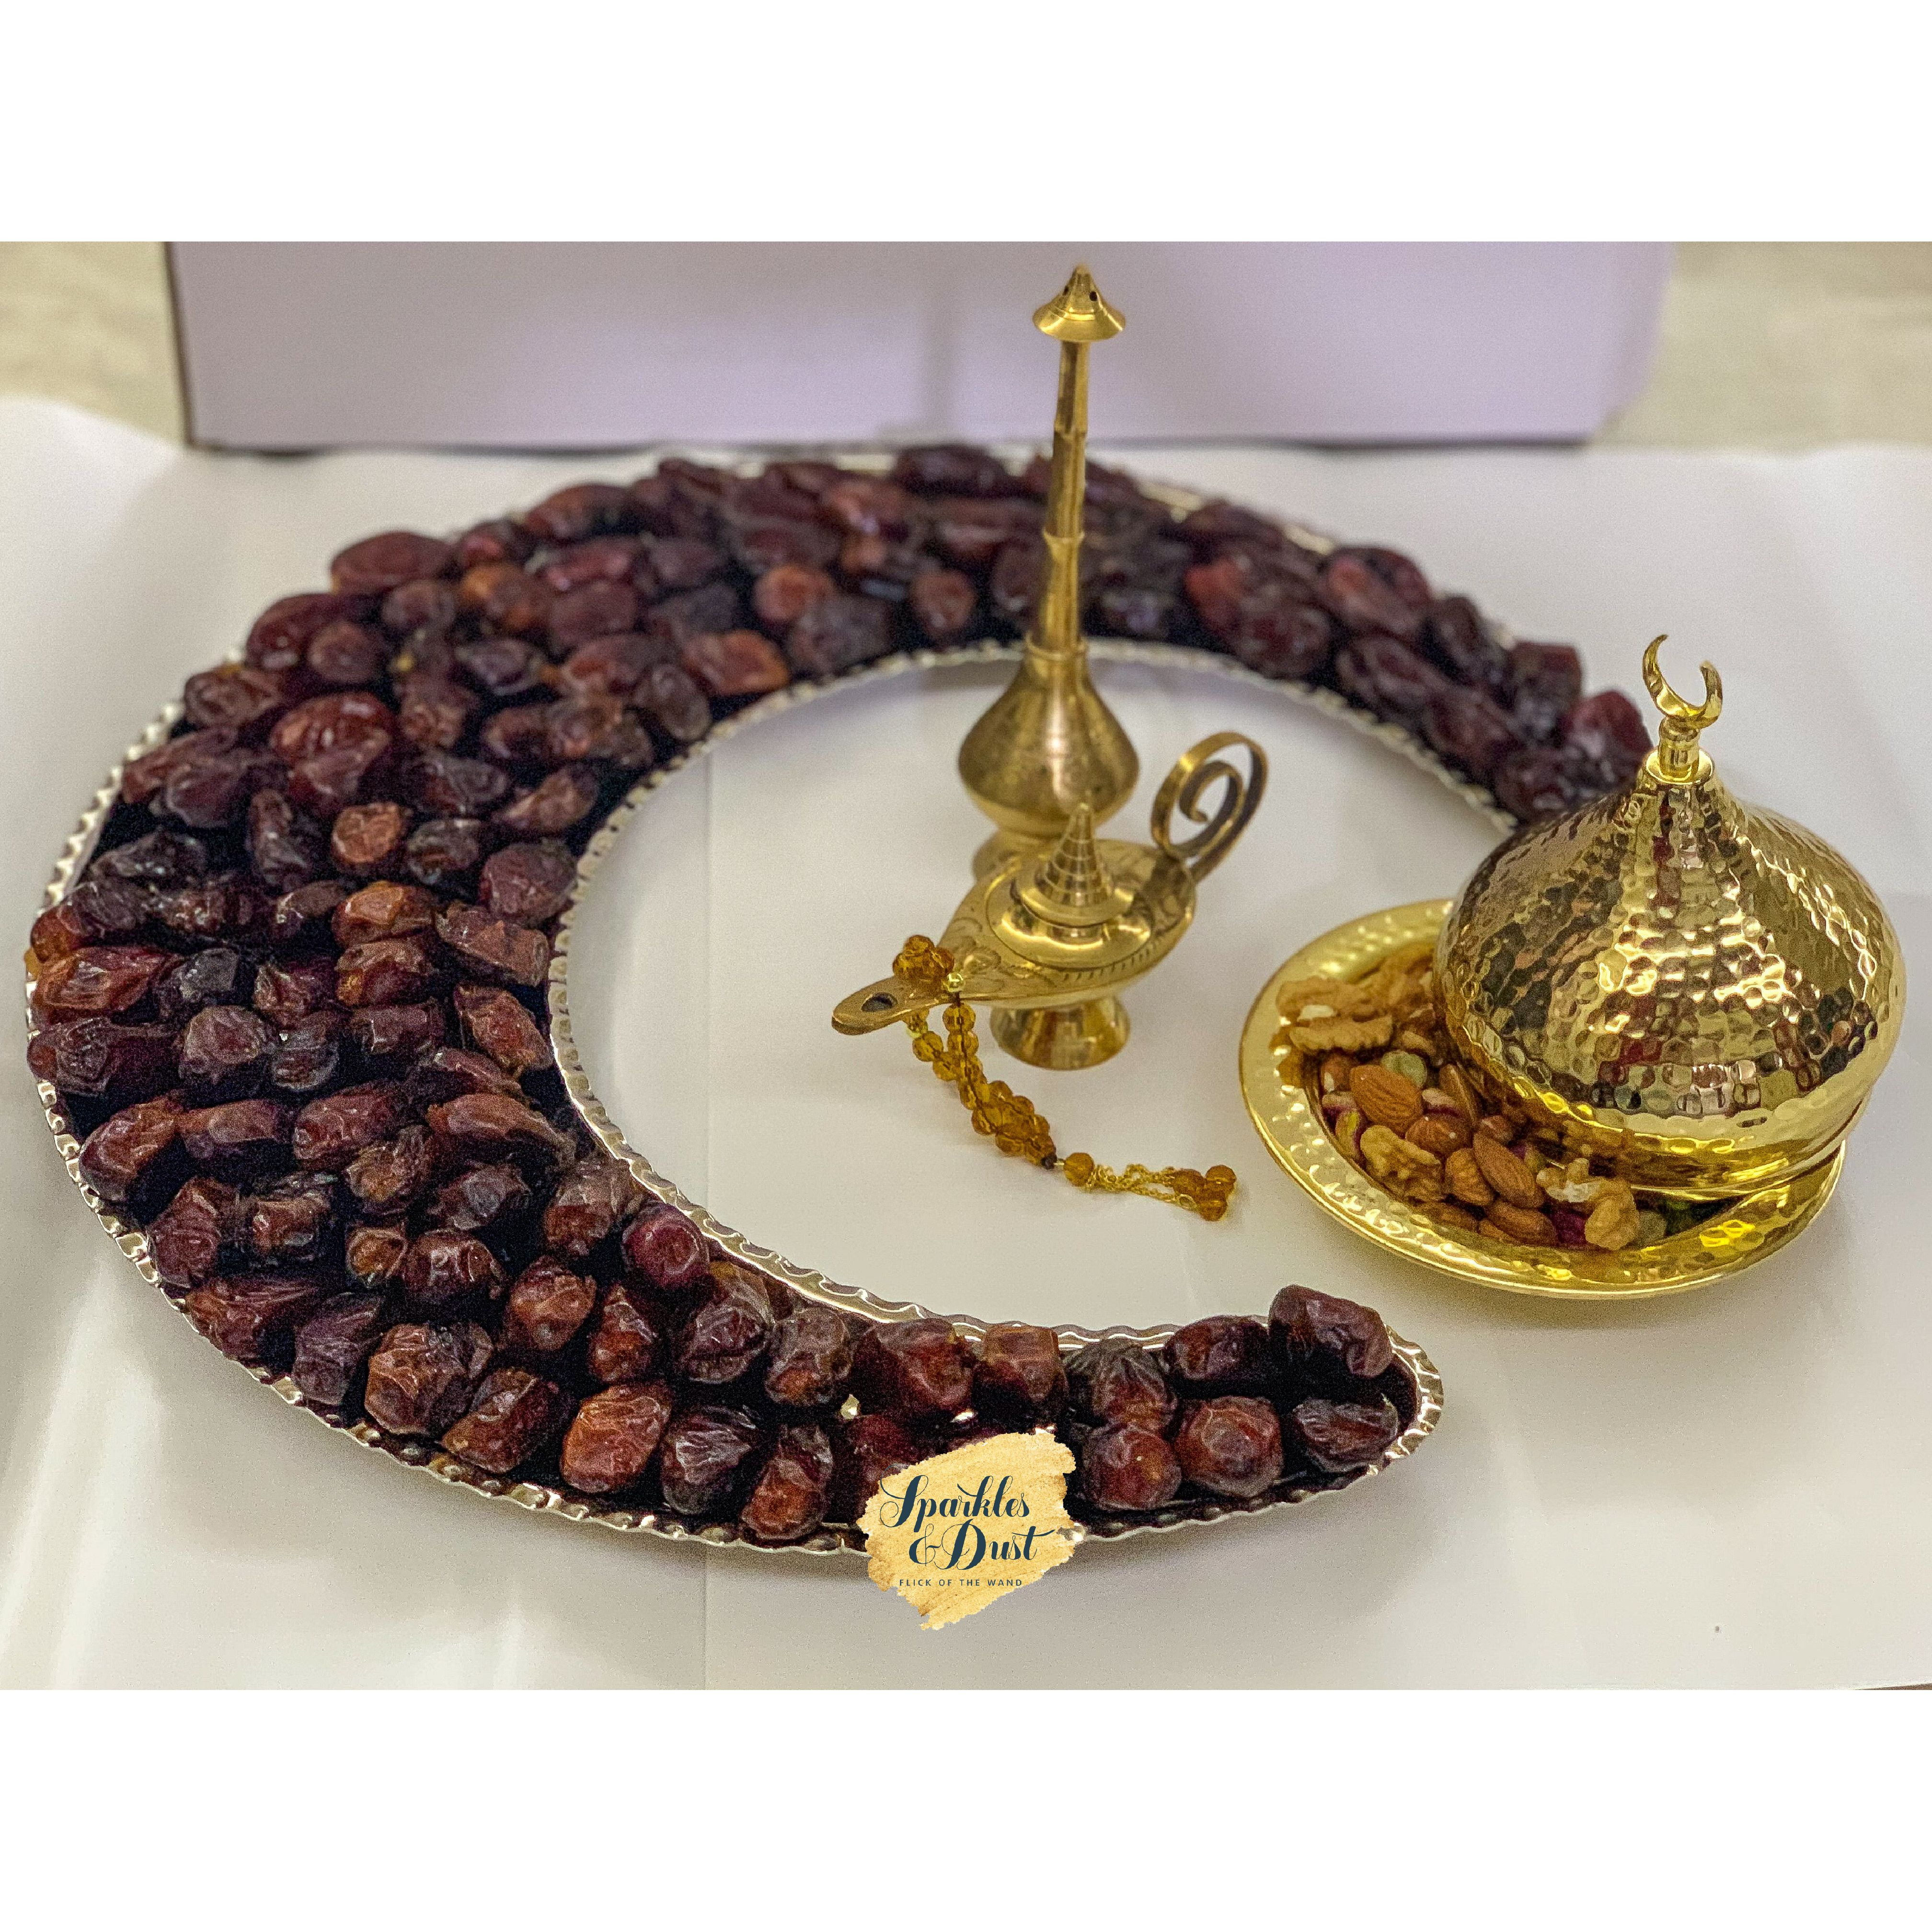 Dates Tray For Ramadan توزيعات رمضان تمر Ramadan Dates Ramadan Gifts